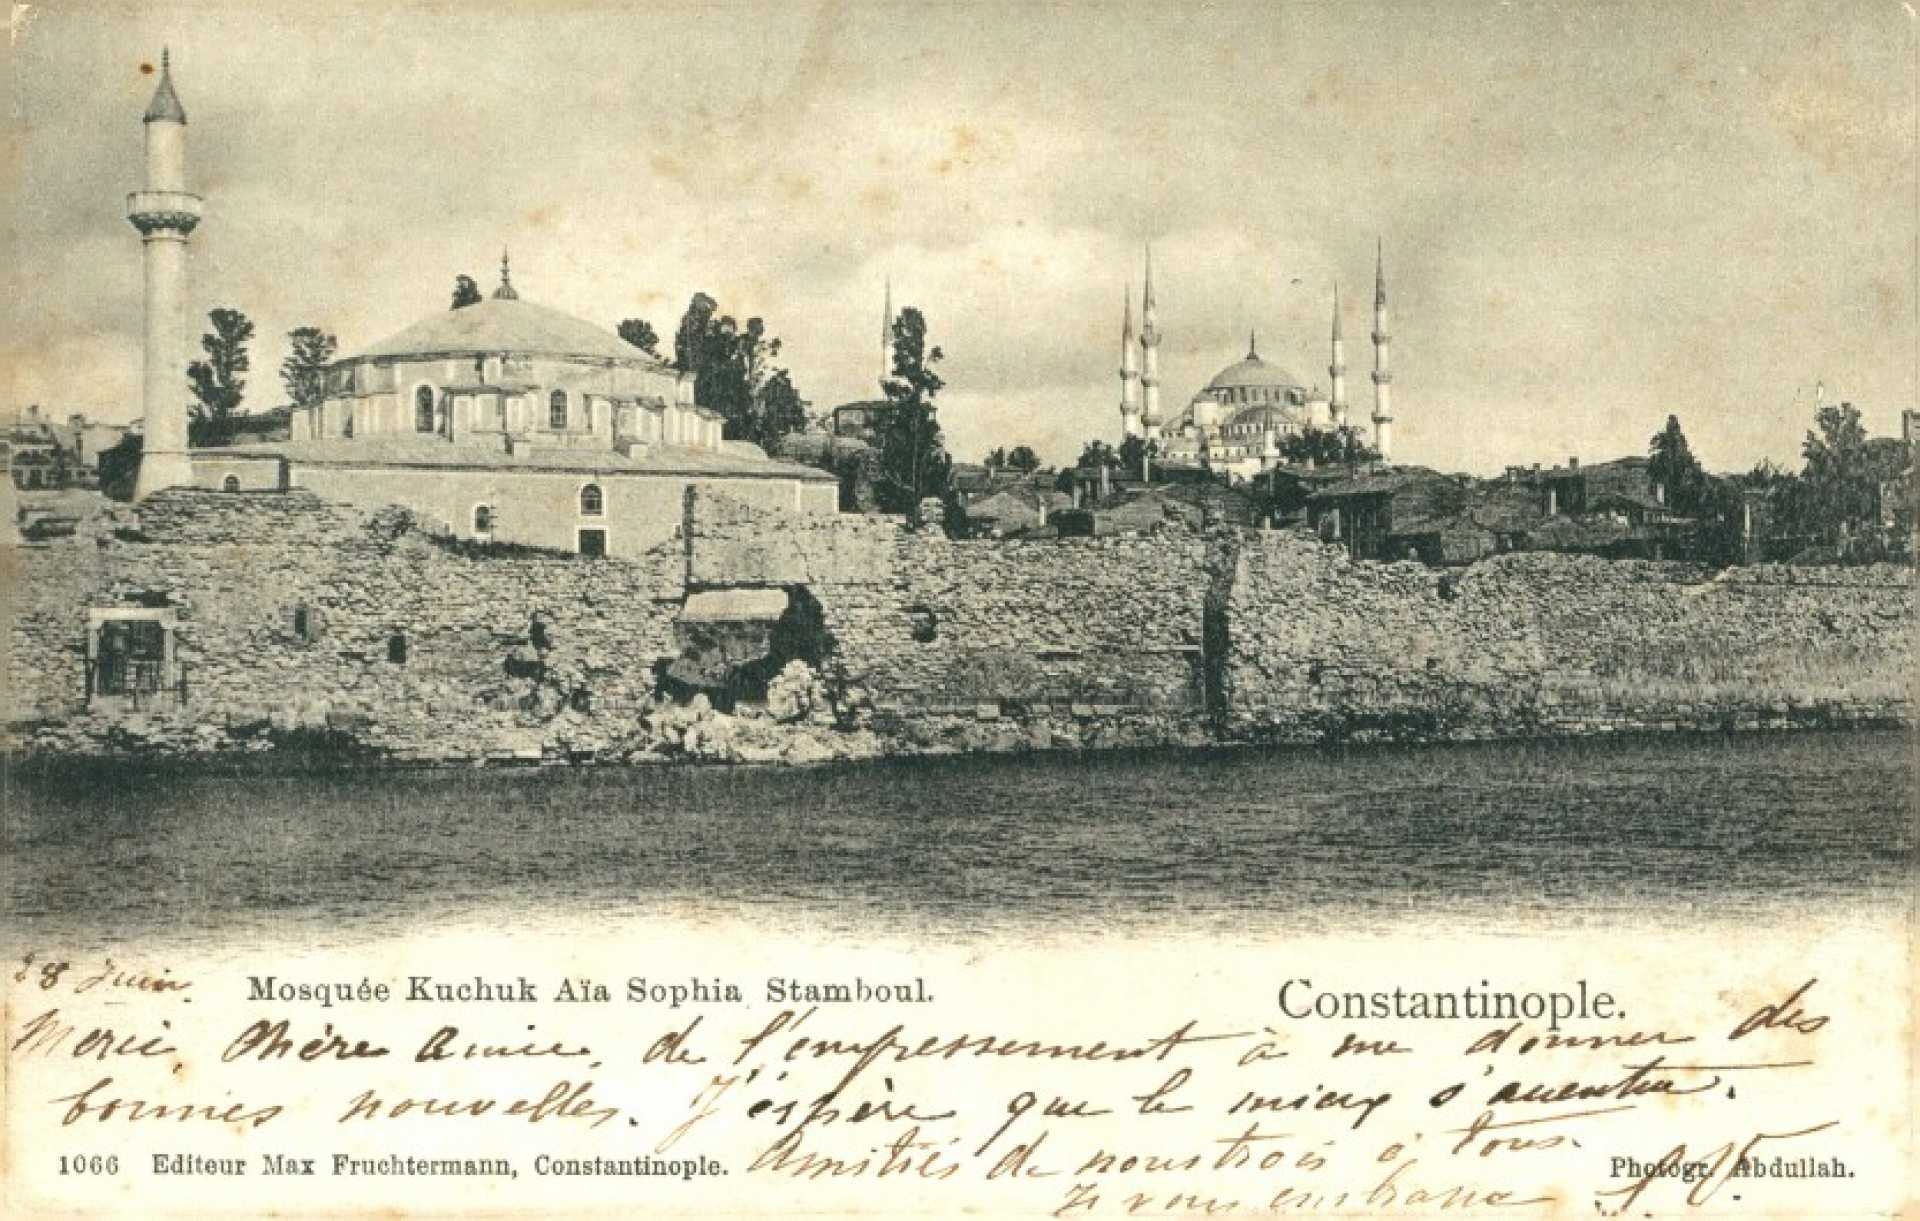 Mosquee Kuchuk Aia Sophia Stamboul